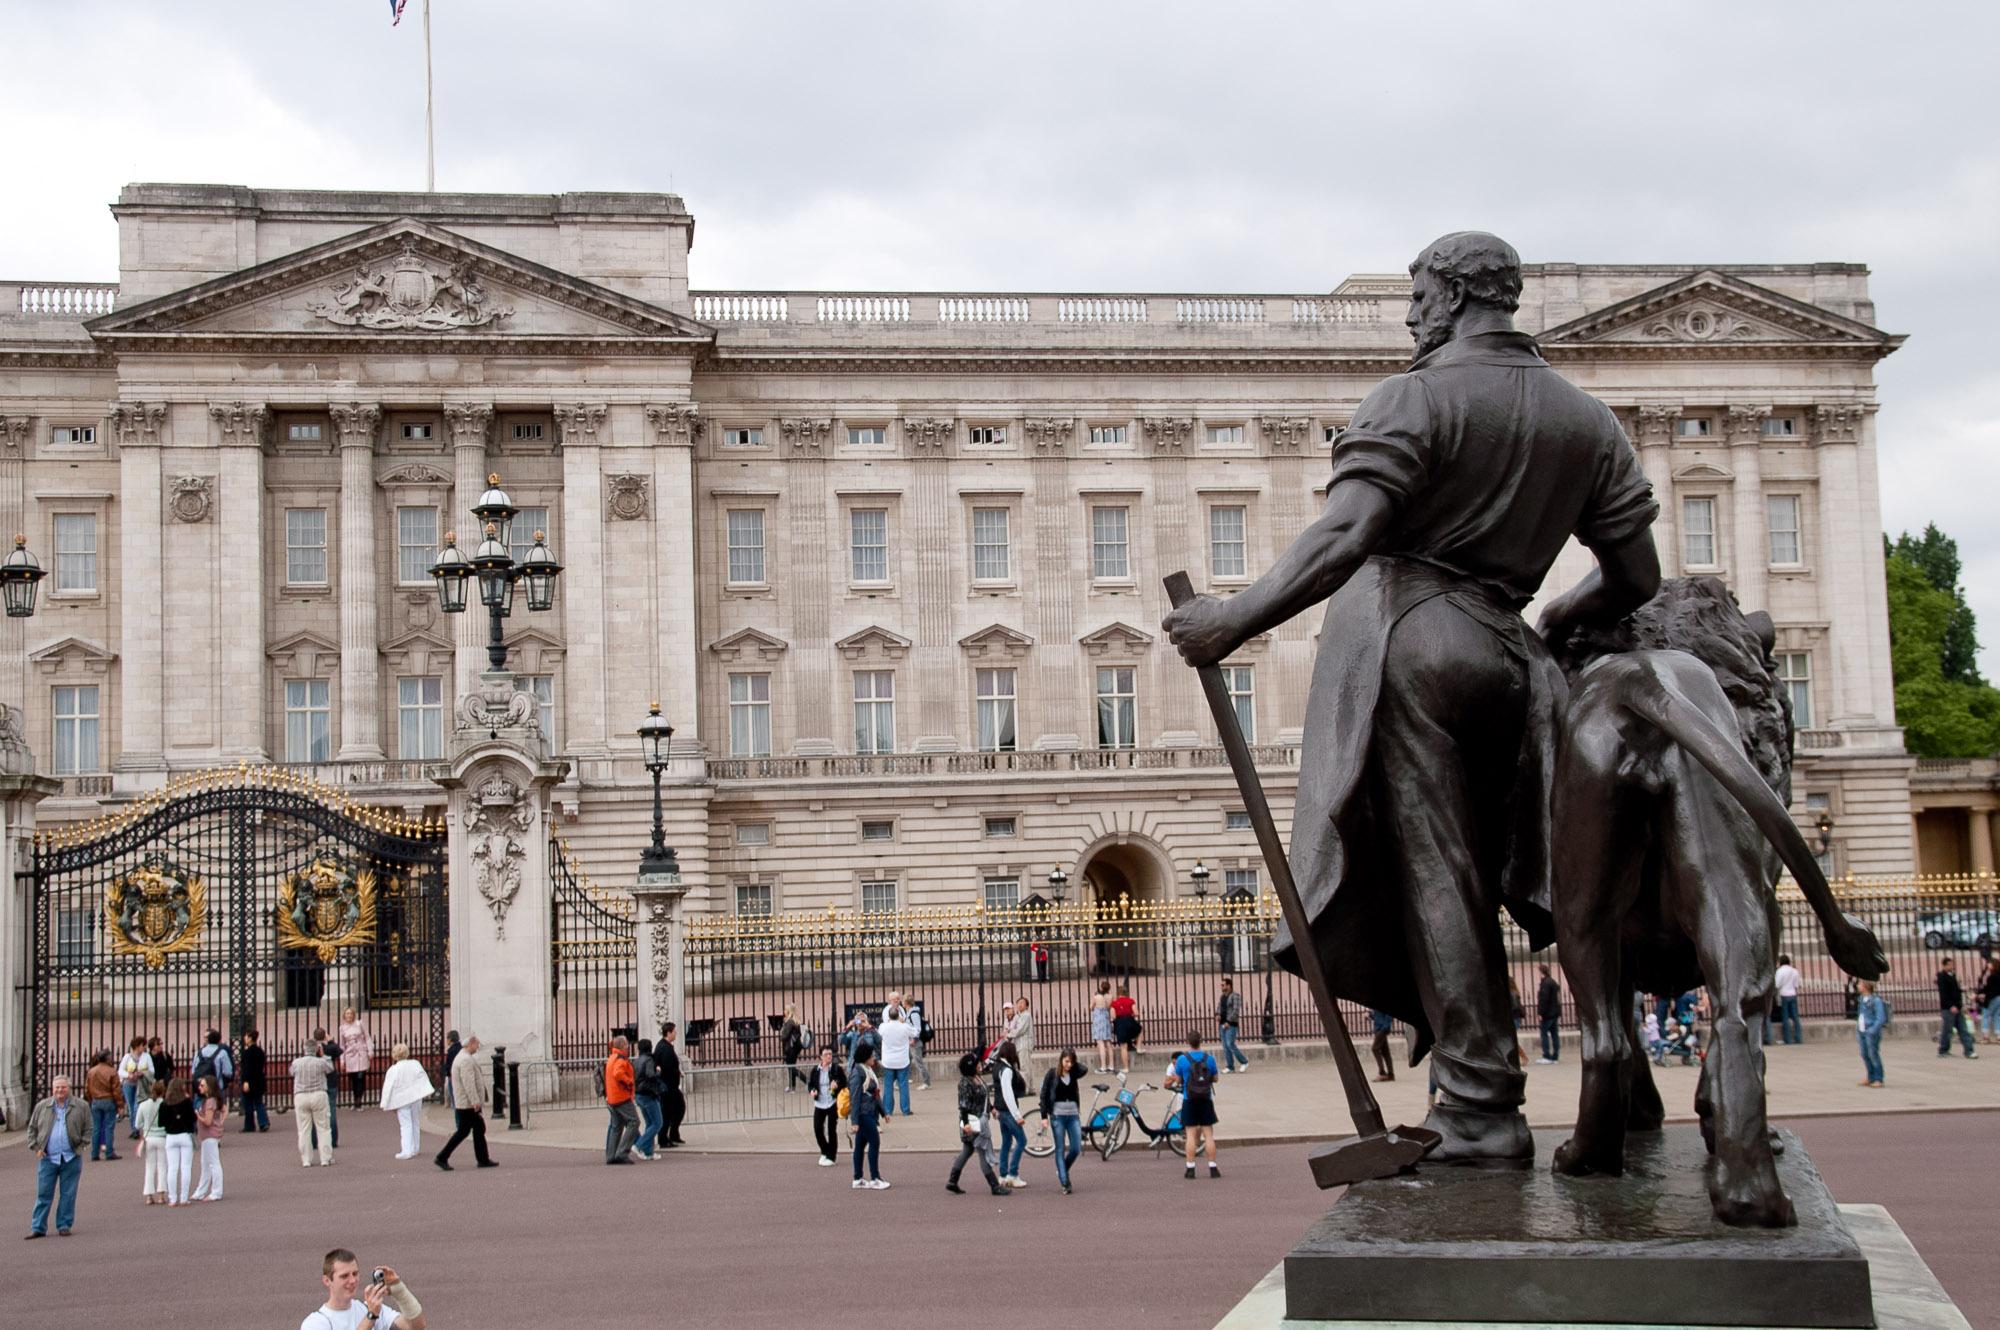 Buckingham Palace III